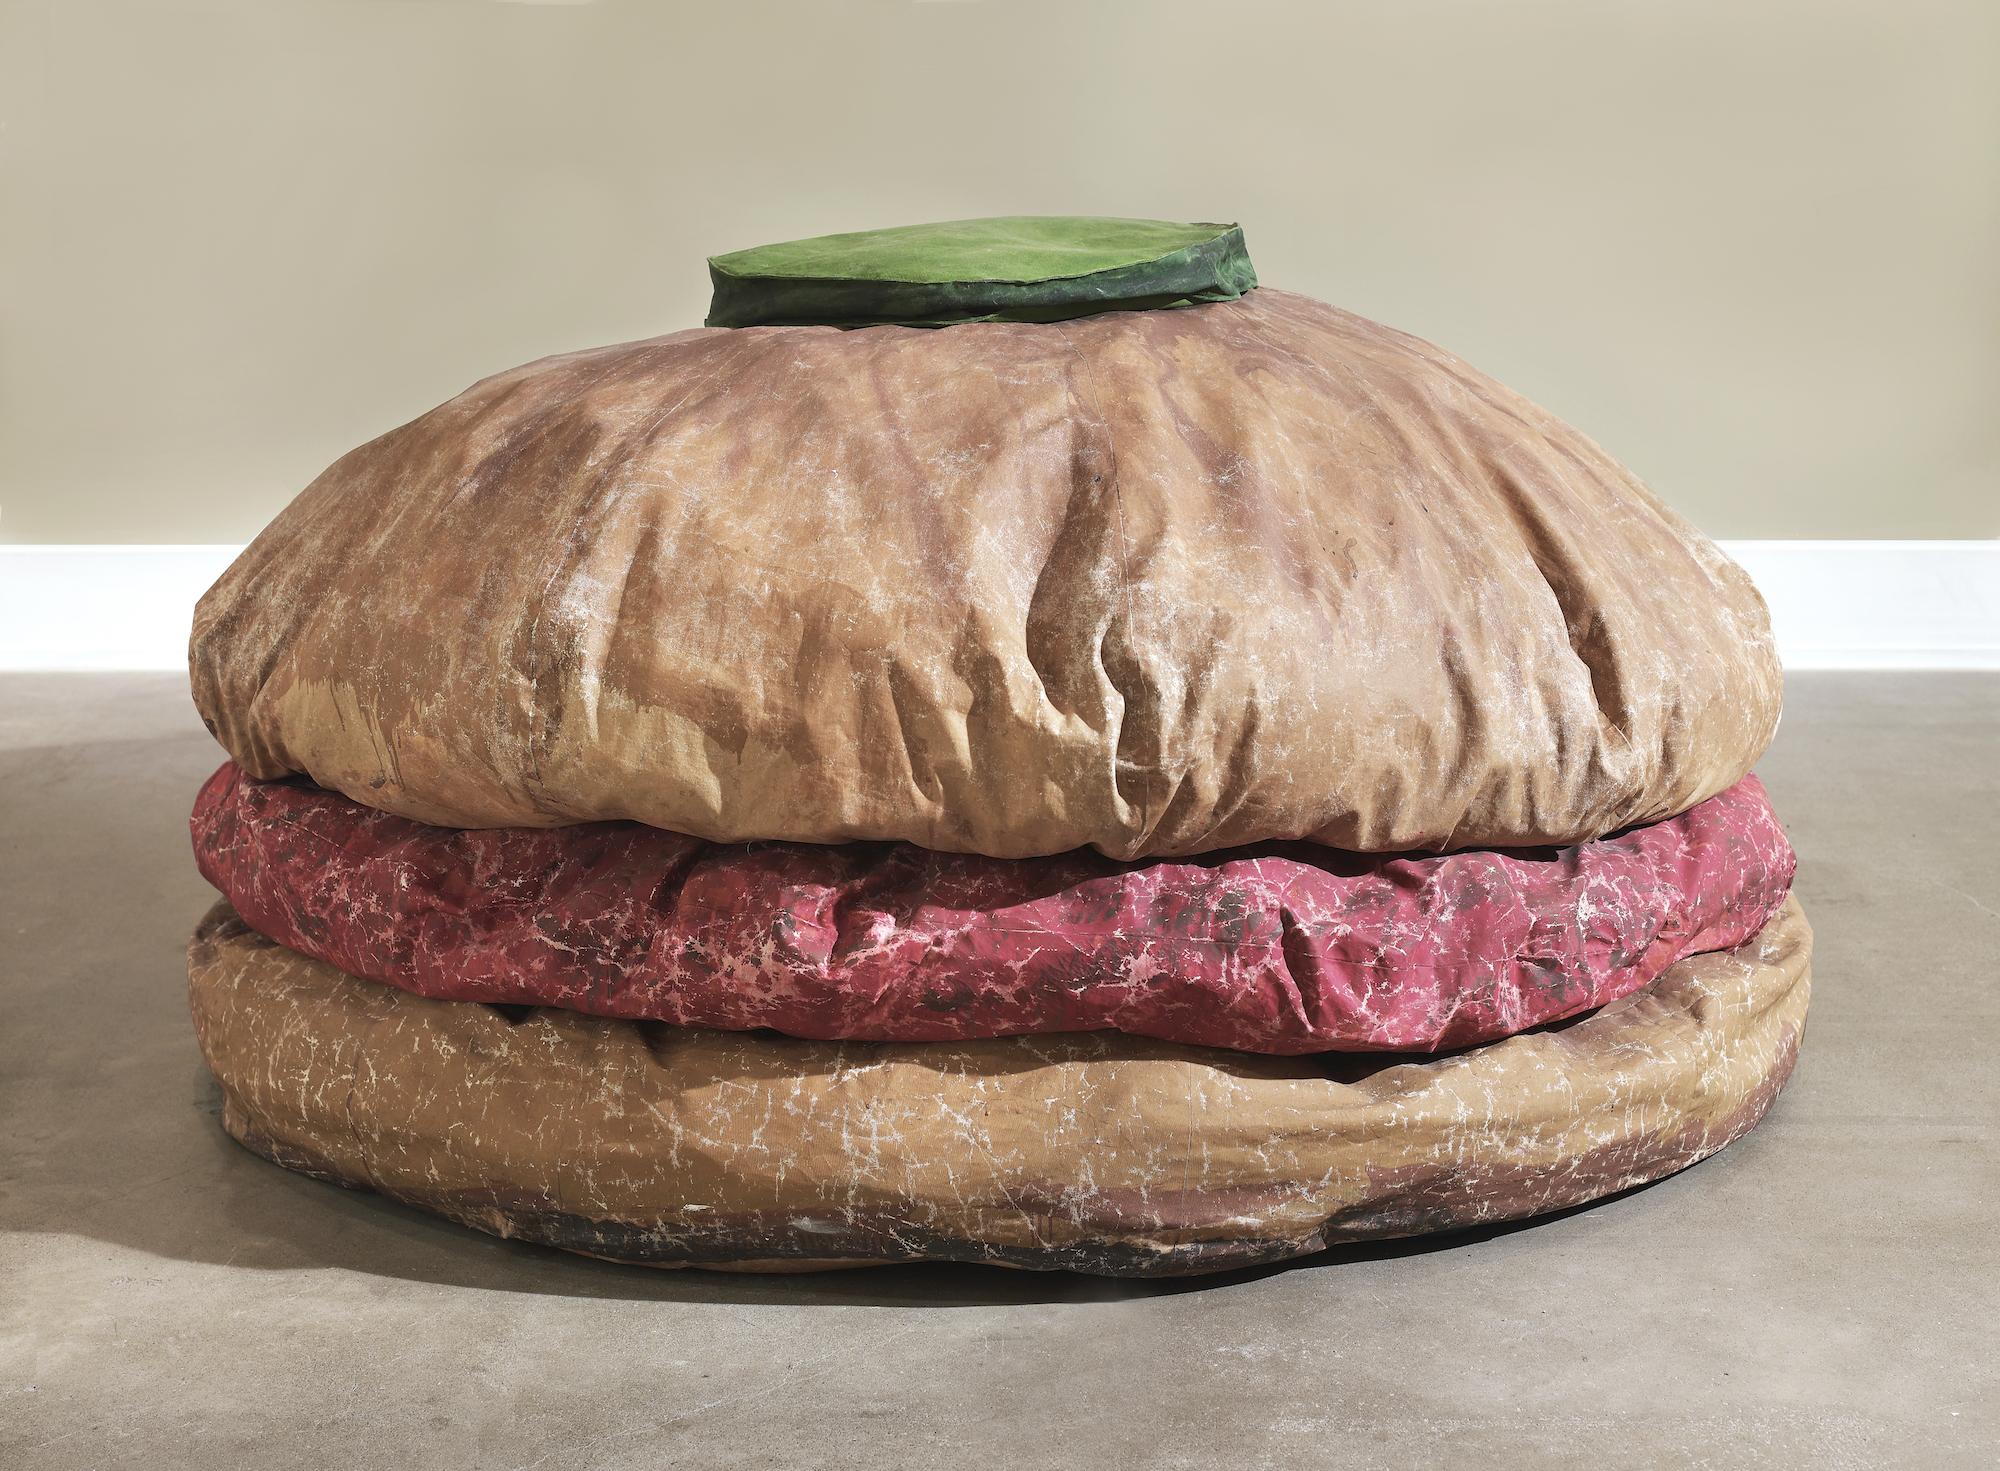 12 Masterful Uses Of Food In Art Artnews Com